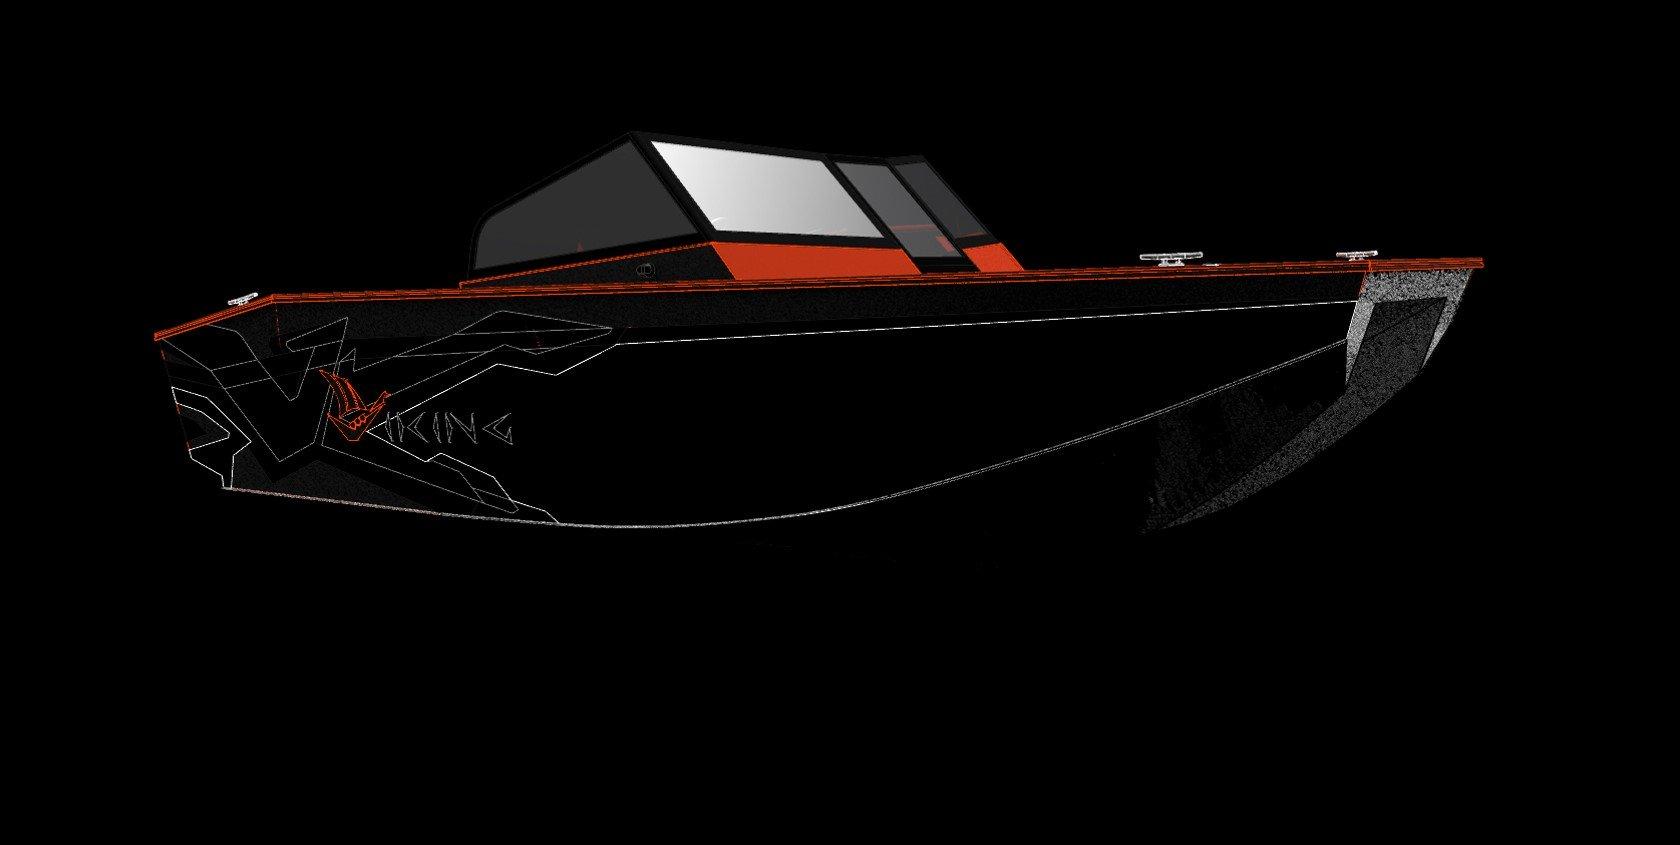 Viking-6.0-CAT-1